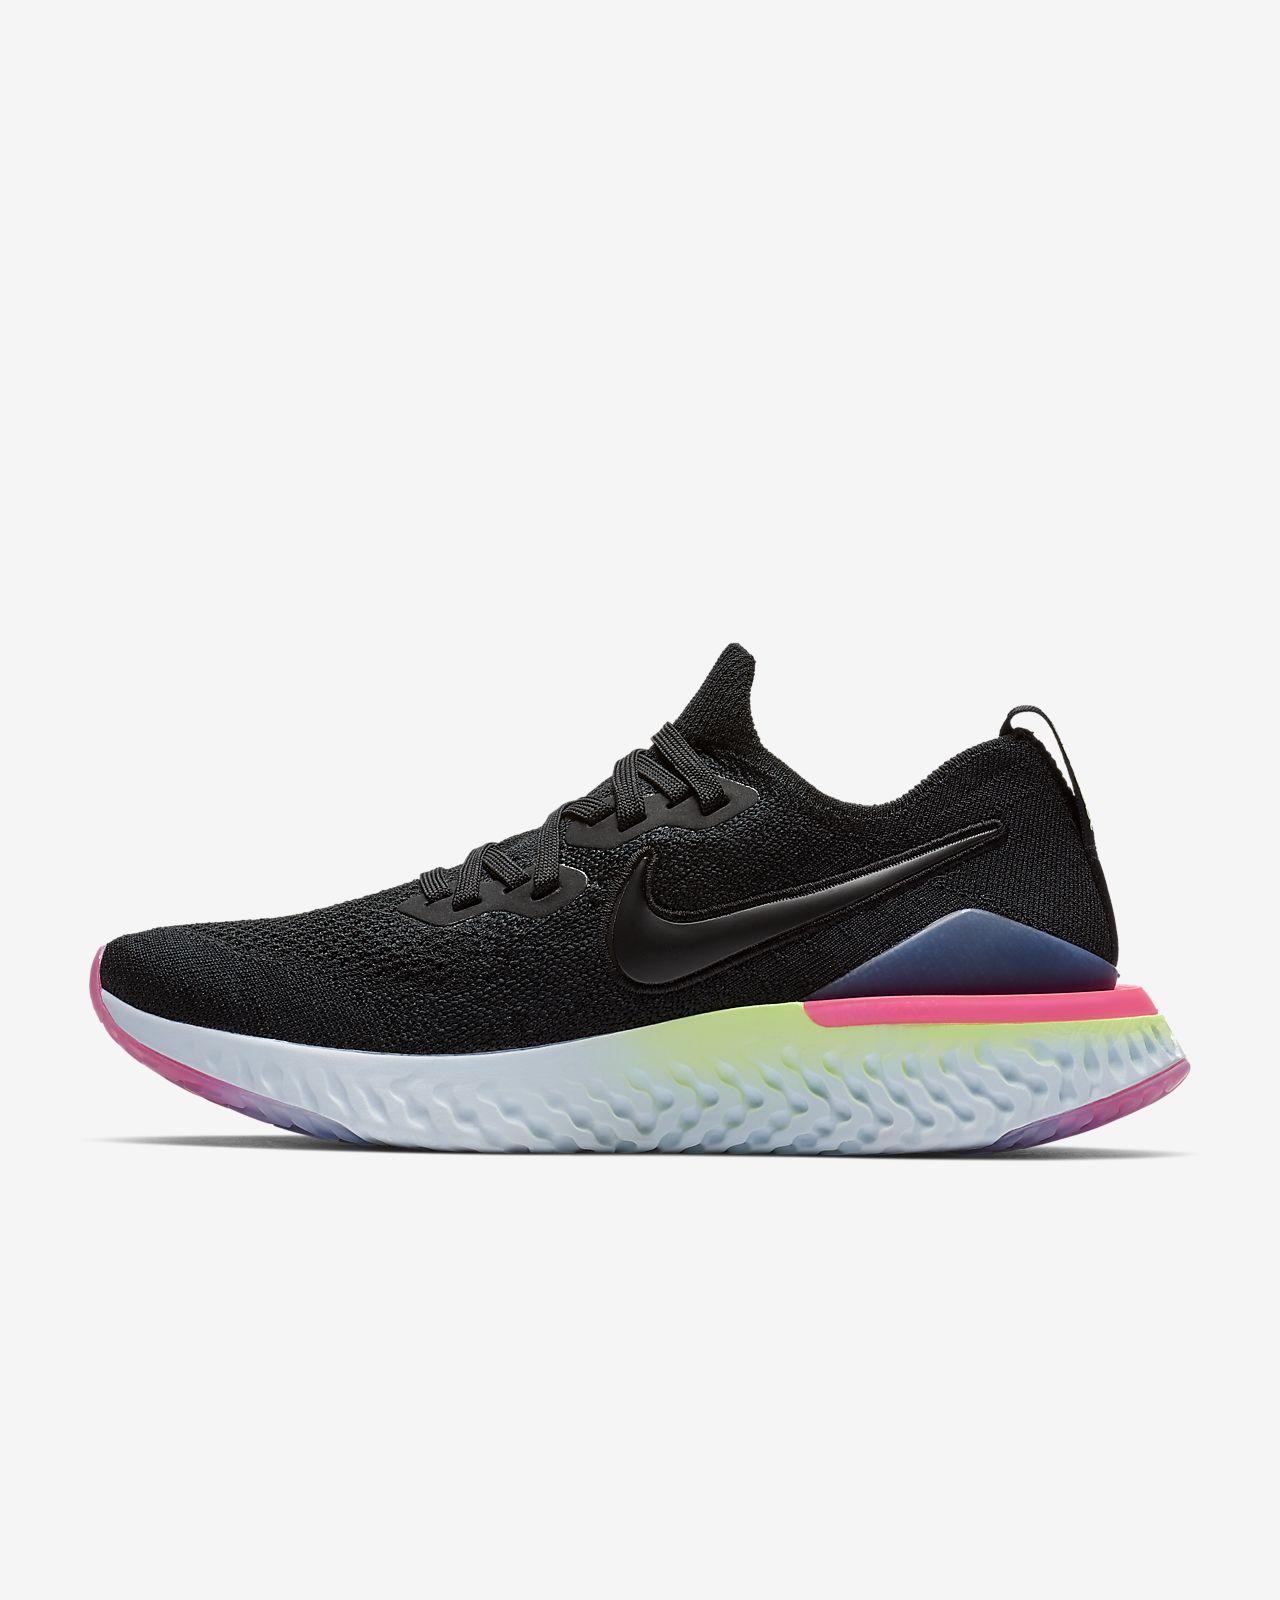 3fdad286432d68 Scarpa da running Nike Epic React Flyknit 2 - Donna. Nike.com IT